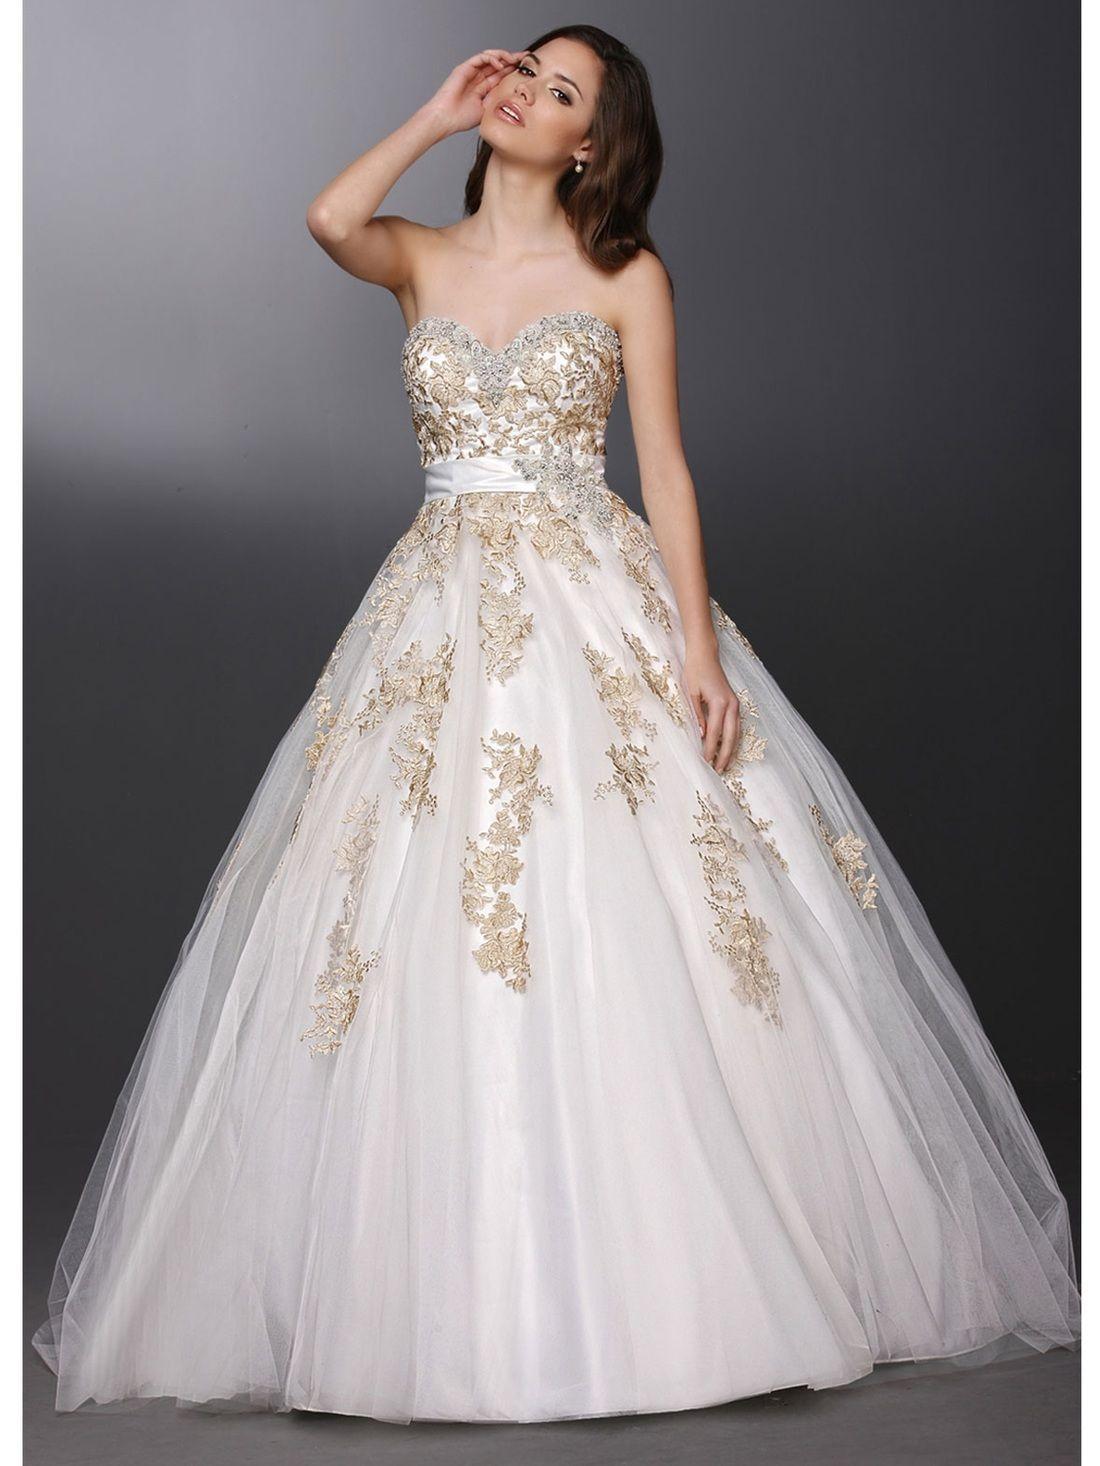 Lovely sweetheart neckline wedding dress with a full ball gown skirt